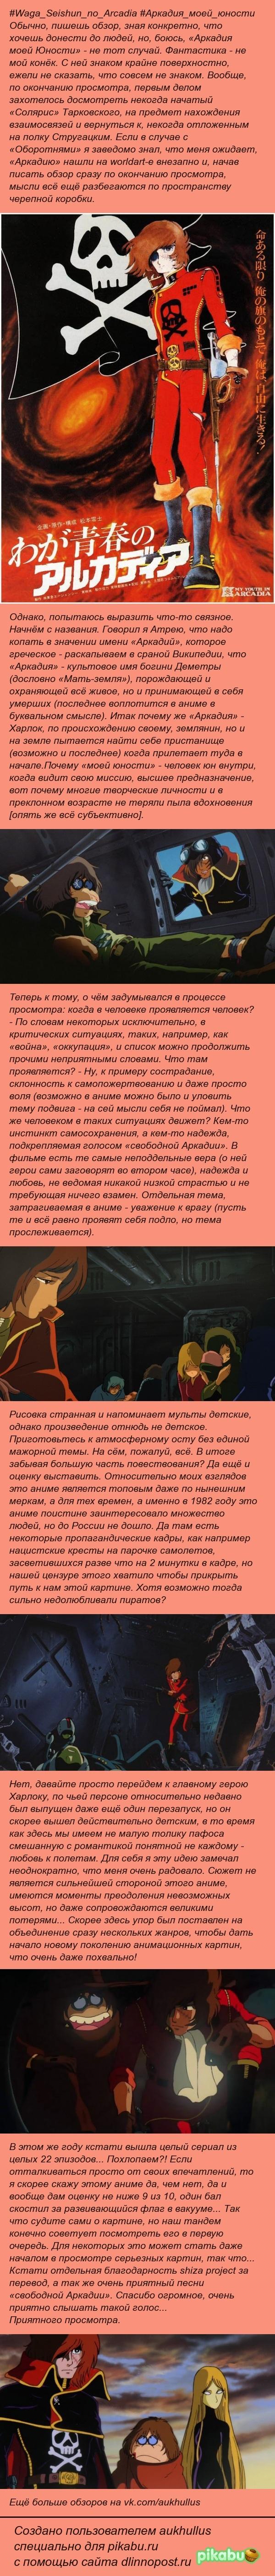 Waga Seishun no Arcadia Аниме, Обзор, Моё, Aukhullus, Длиннопост